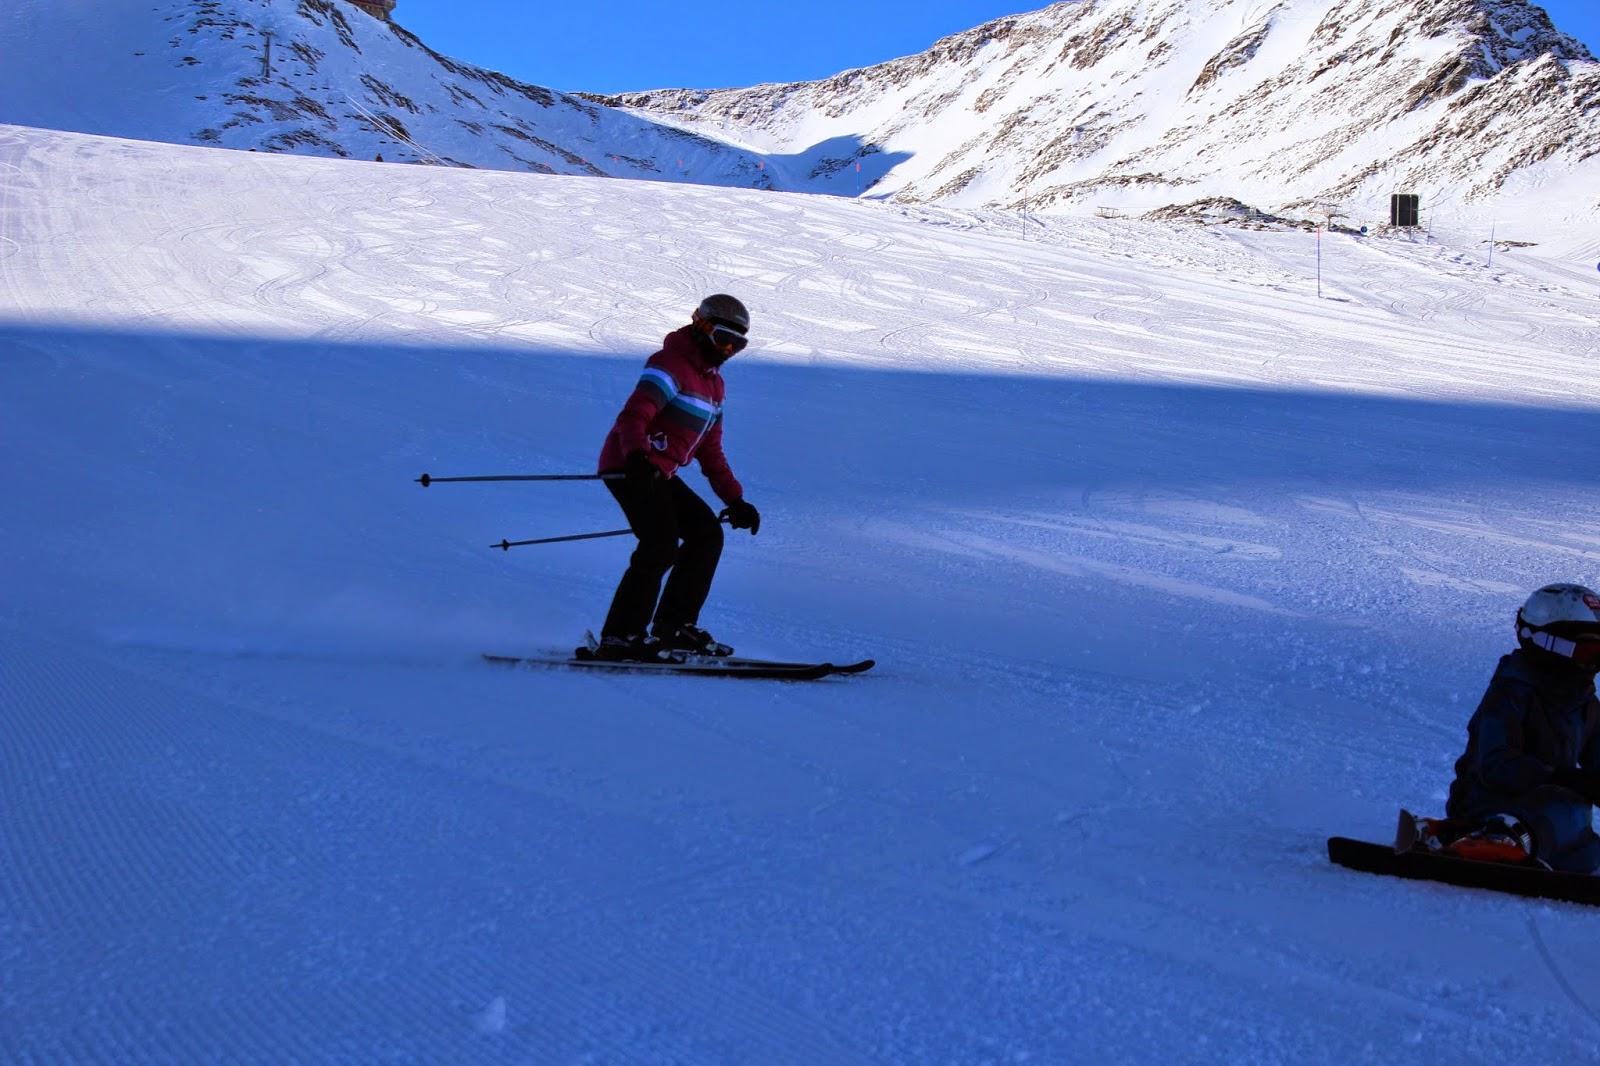 narty, włochy narty, ski italia blogger, nordica ski, snow , piekna pogoda na narty, trasy narciarskie alpy, sudtirol alps